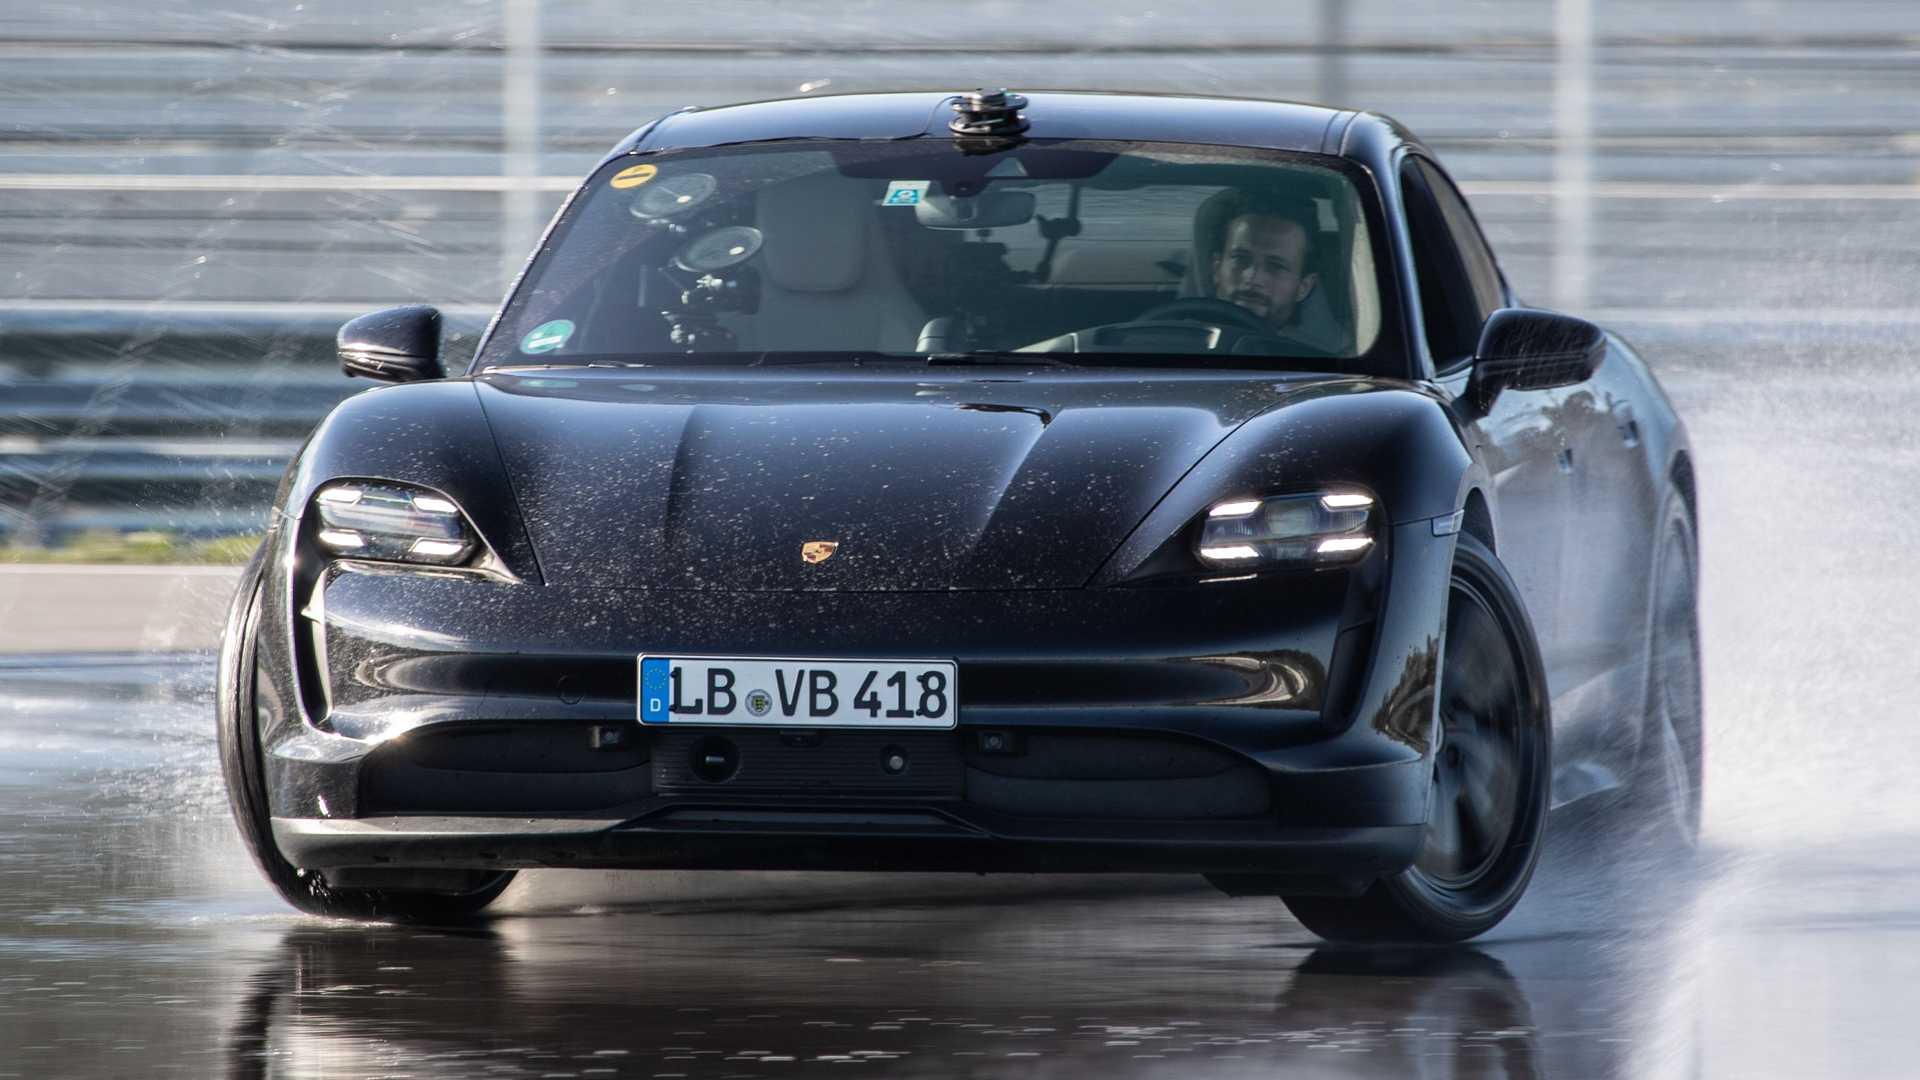 porsche taycan ev drifting for drift record 1 خودرو برقی, پورشه تایکان